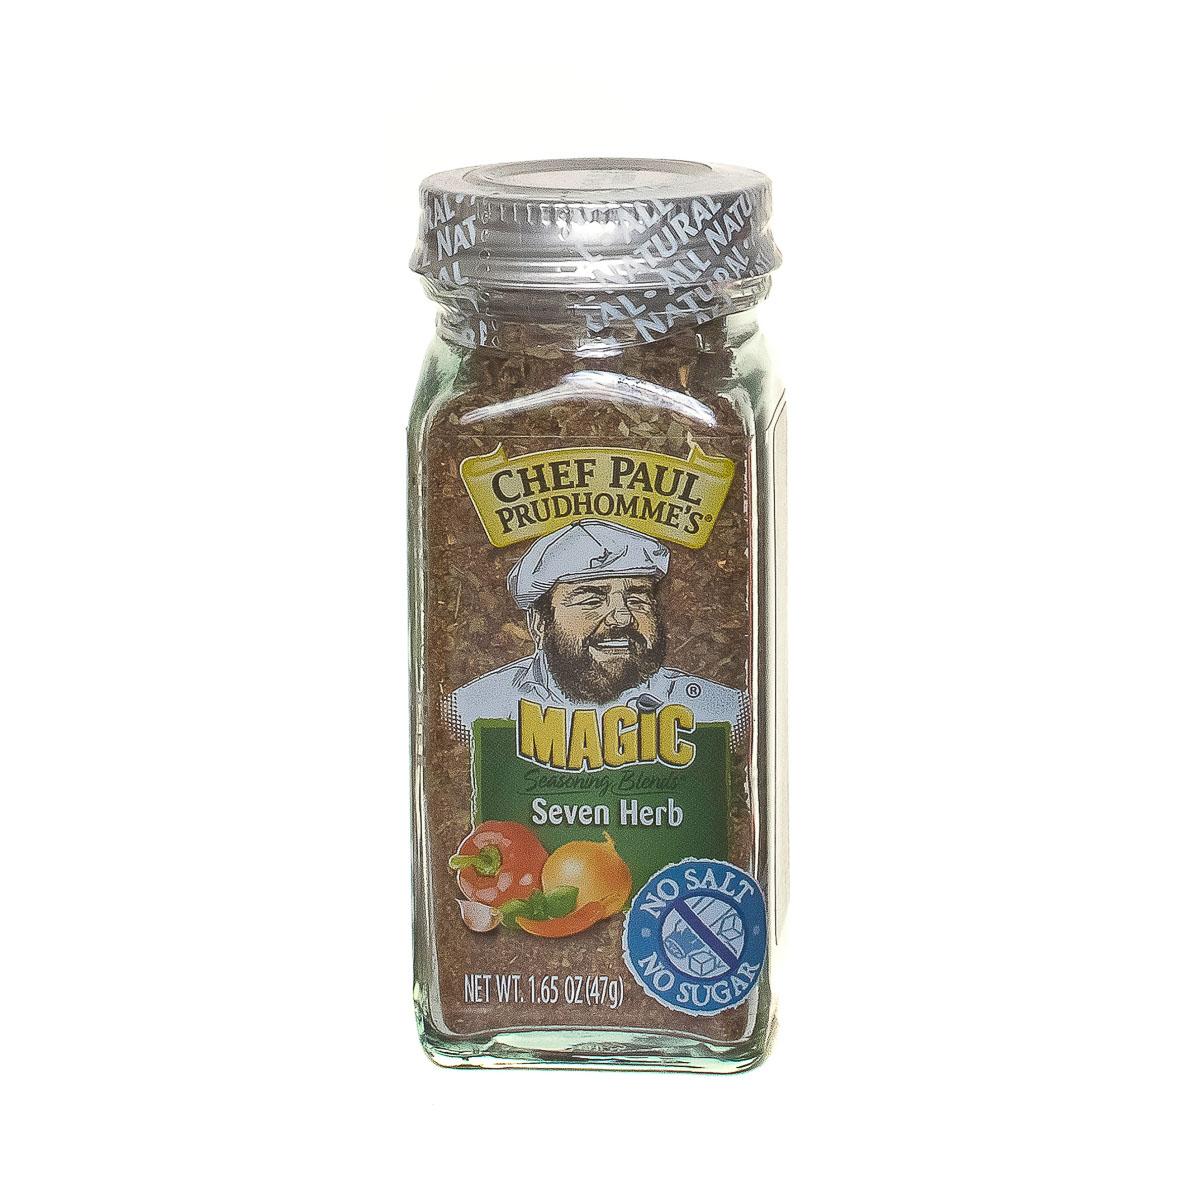 Seven Herb Magic (Sete Ervas)